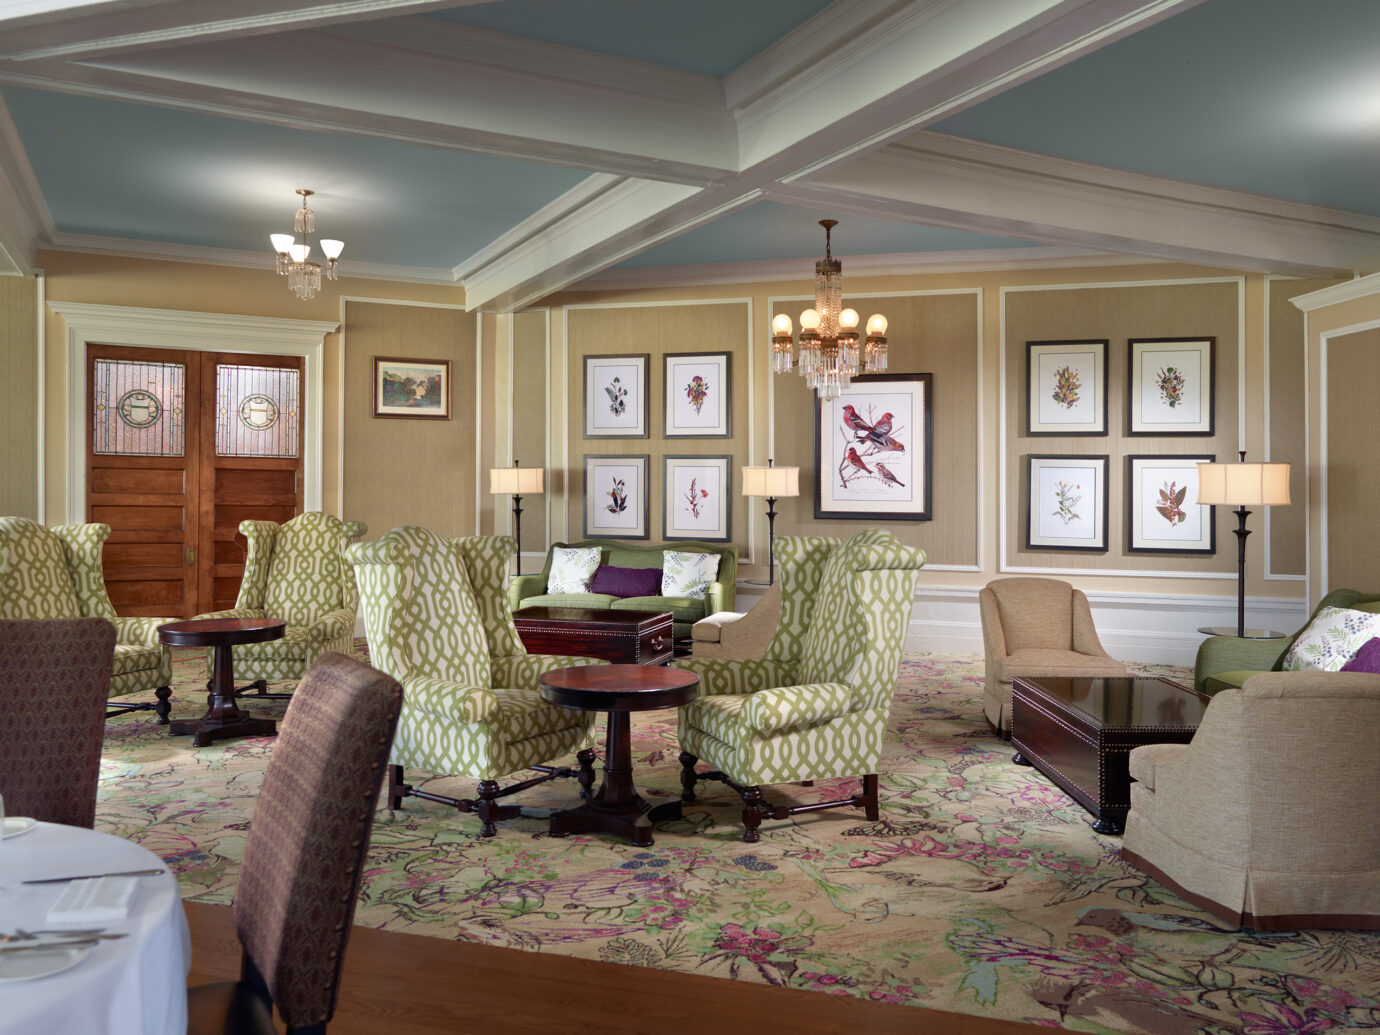 Livingroom at Omni Mount Washington Resort, Bretton Woods, NH